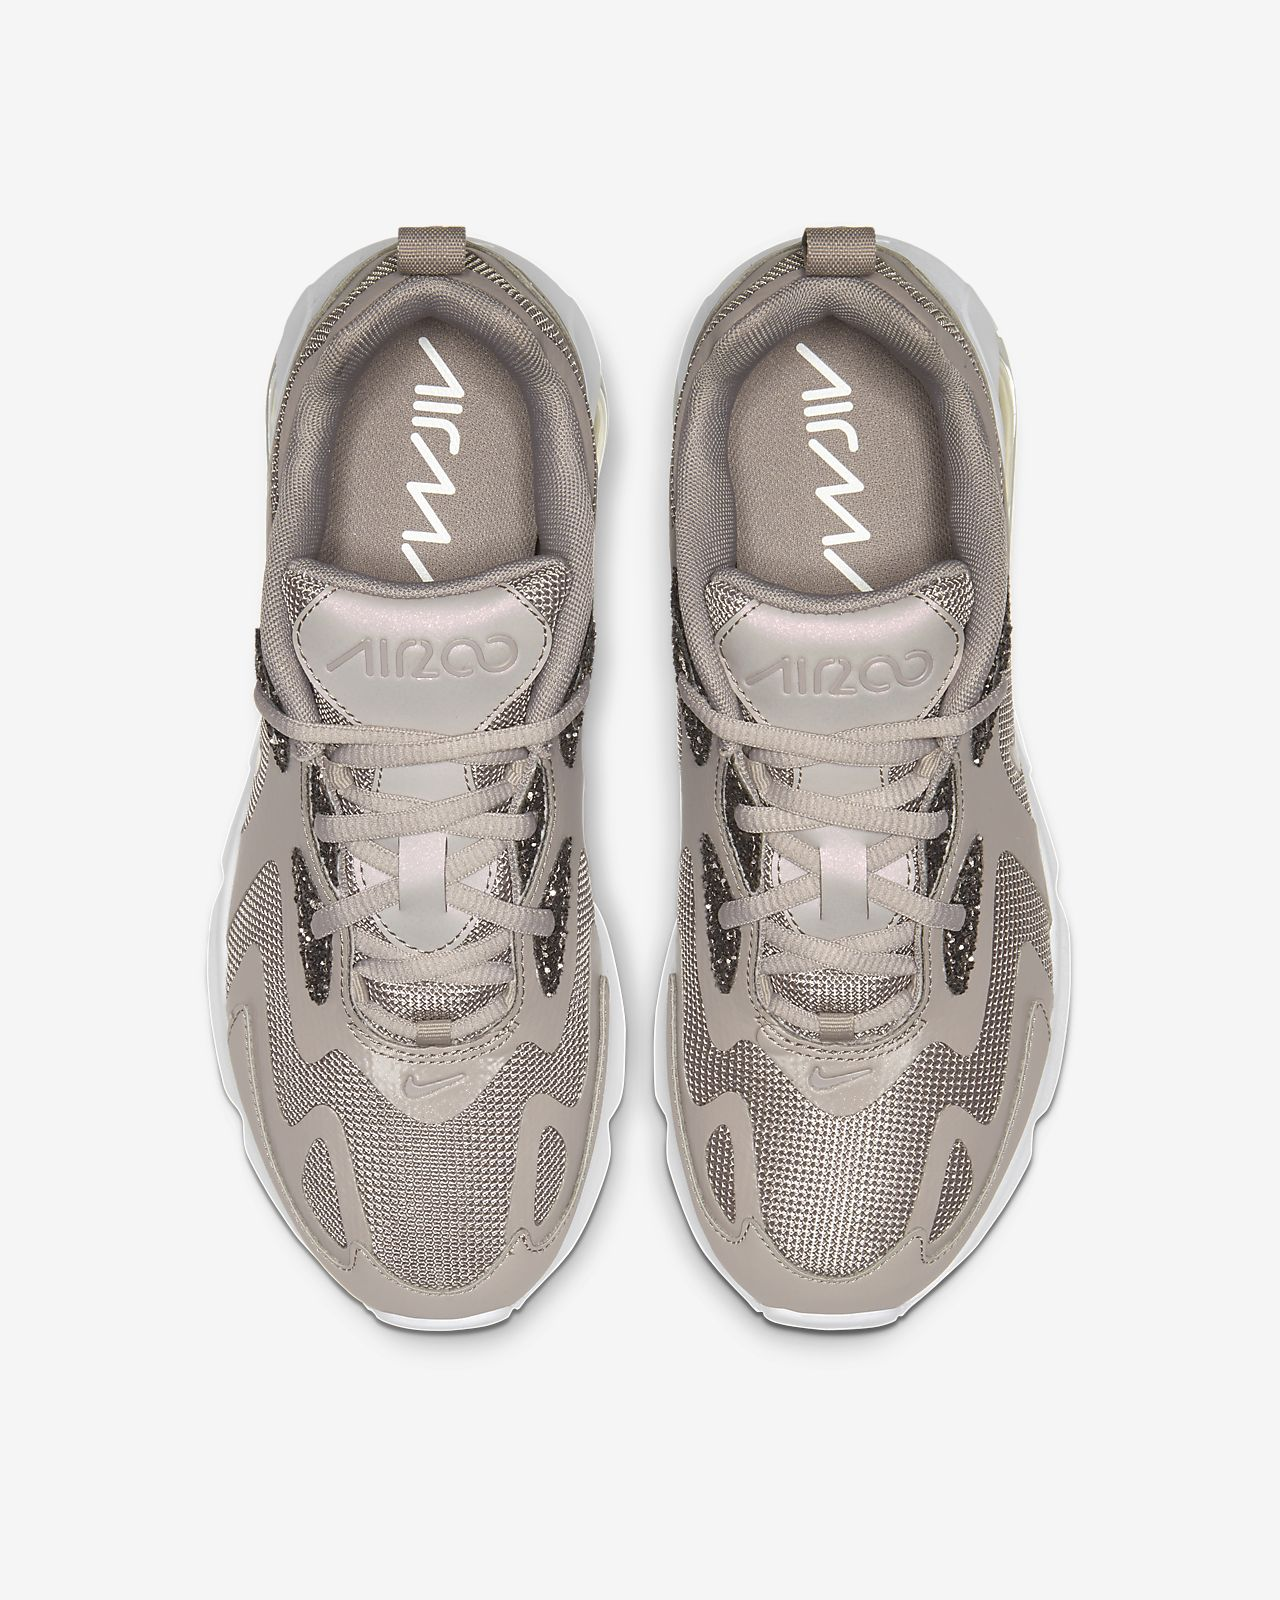 Nike Air Max Thea Glitter | AT0067 200 | Sneakerjagers